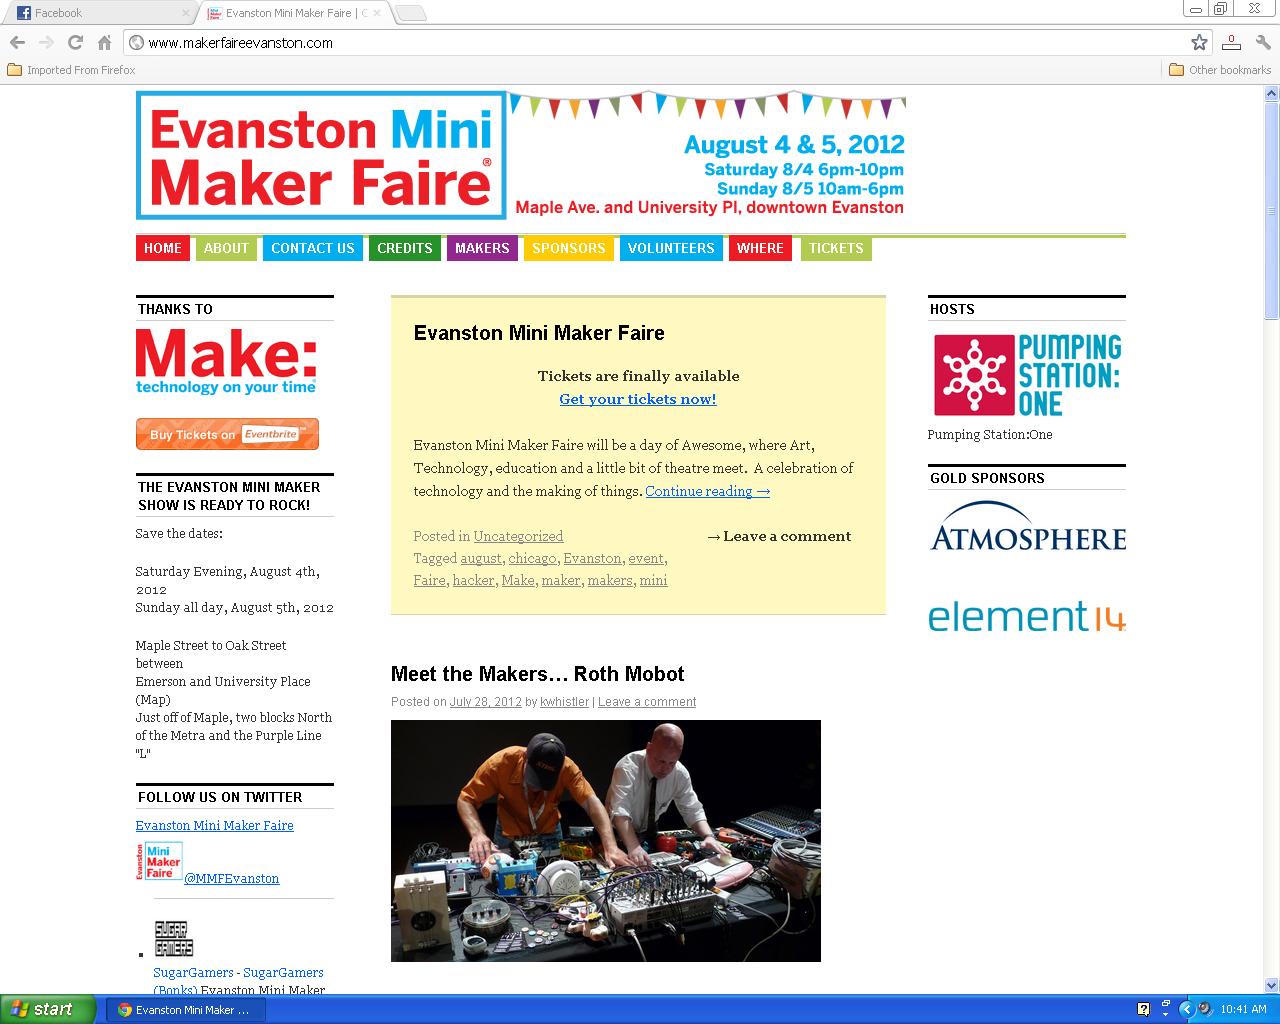 roth mobot at evanston mini maker faire